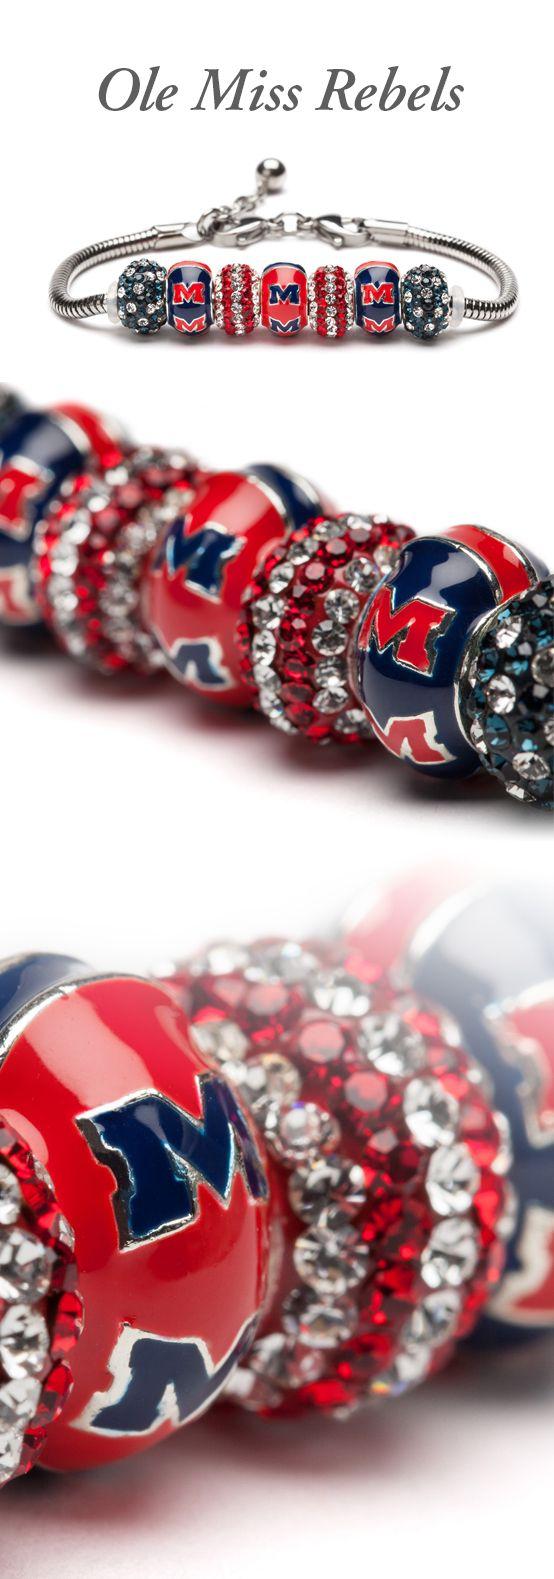 Ole Miss Jewelry | Ole Miss Rebels.  www.StoneArmory.com